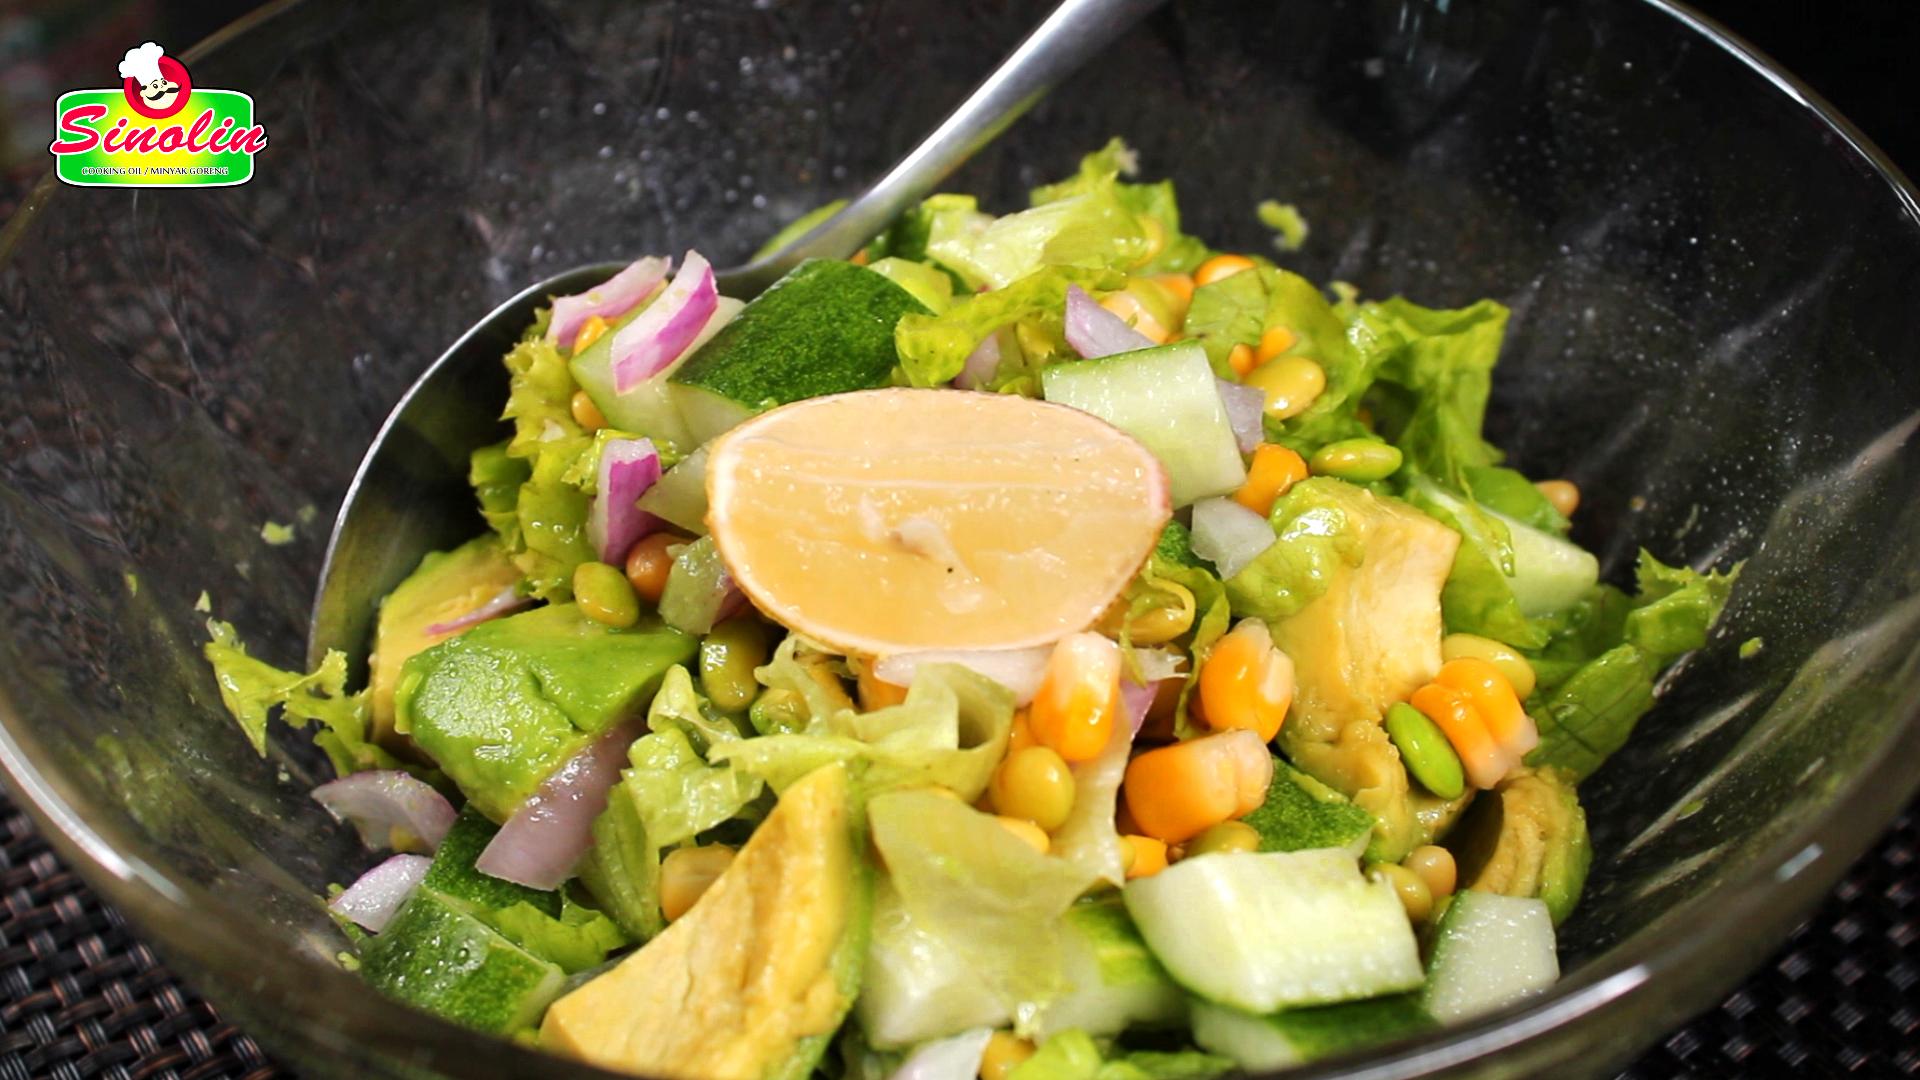 Salad Alpukat Edamame oleh Dapur Sinolin